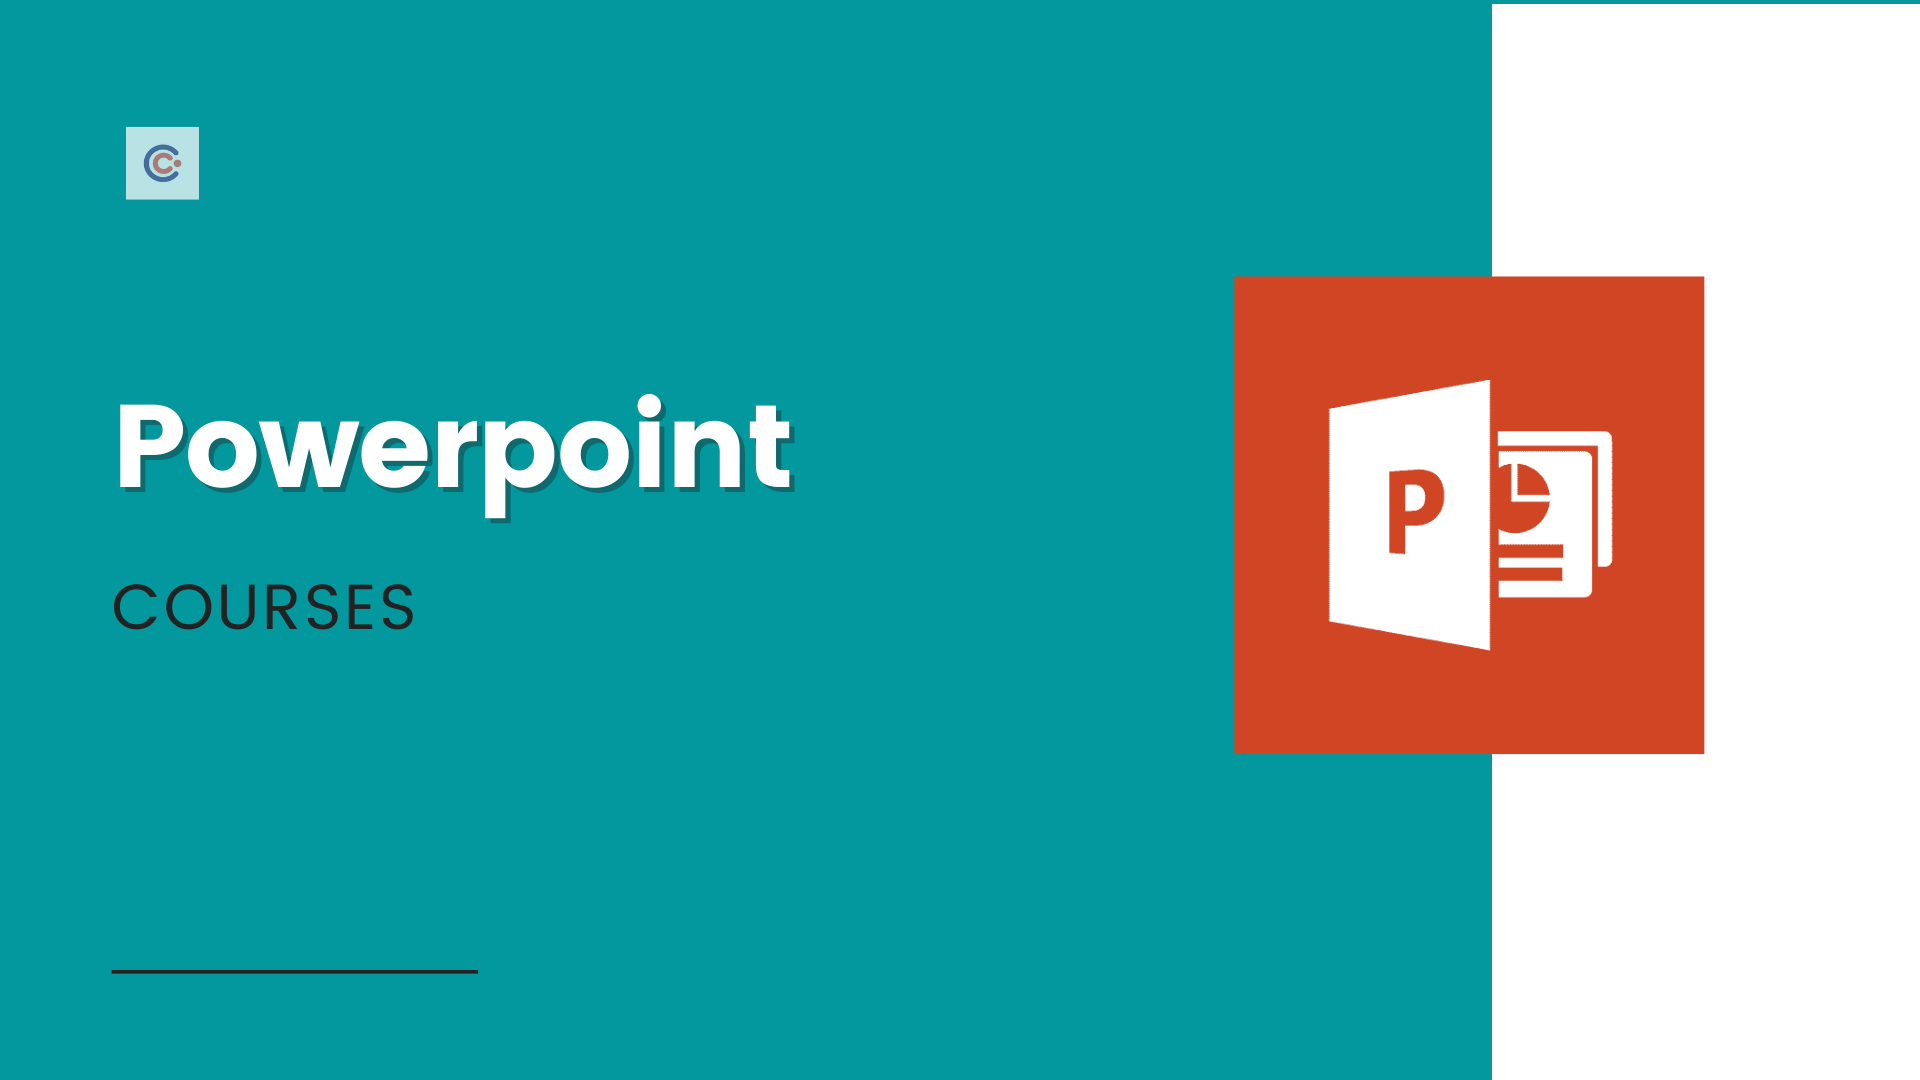 8 Best PowerPoint Courses - Learn Powerpoint Online